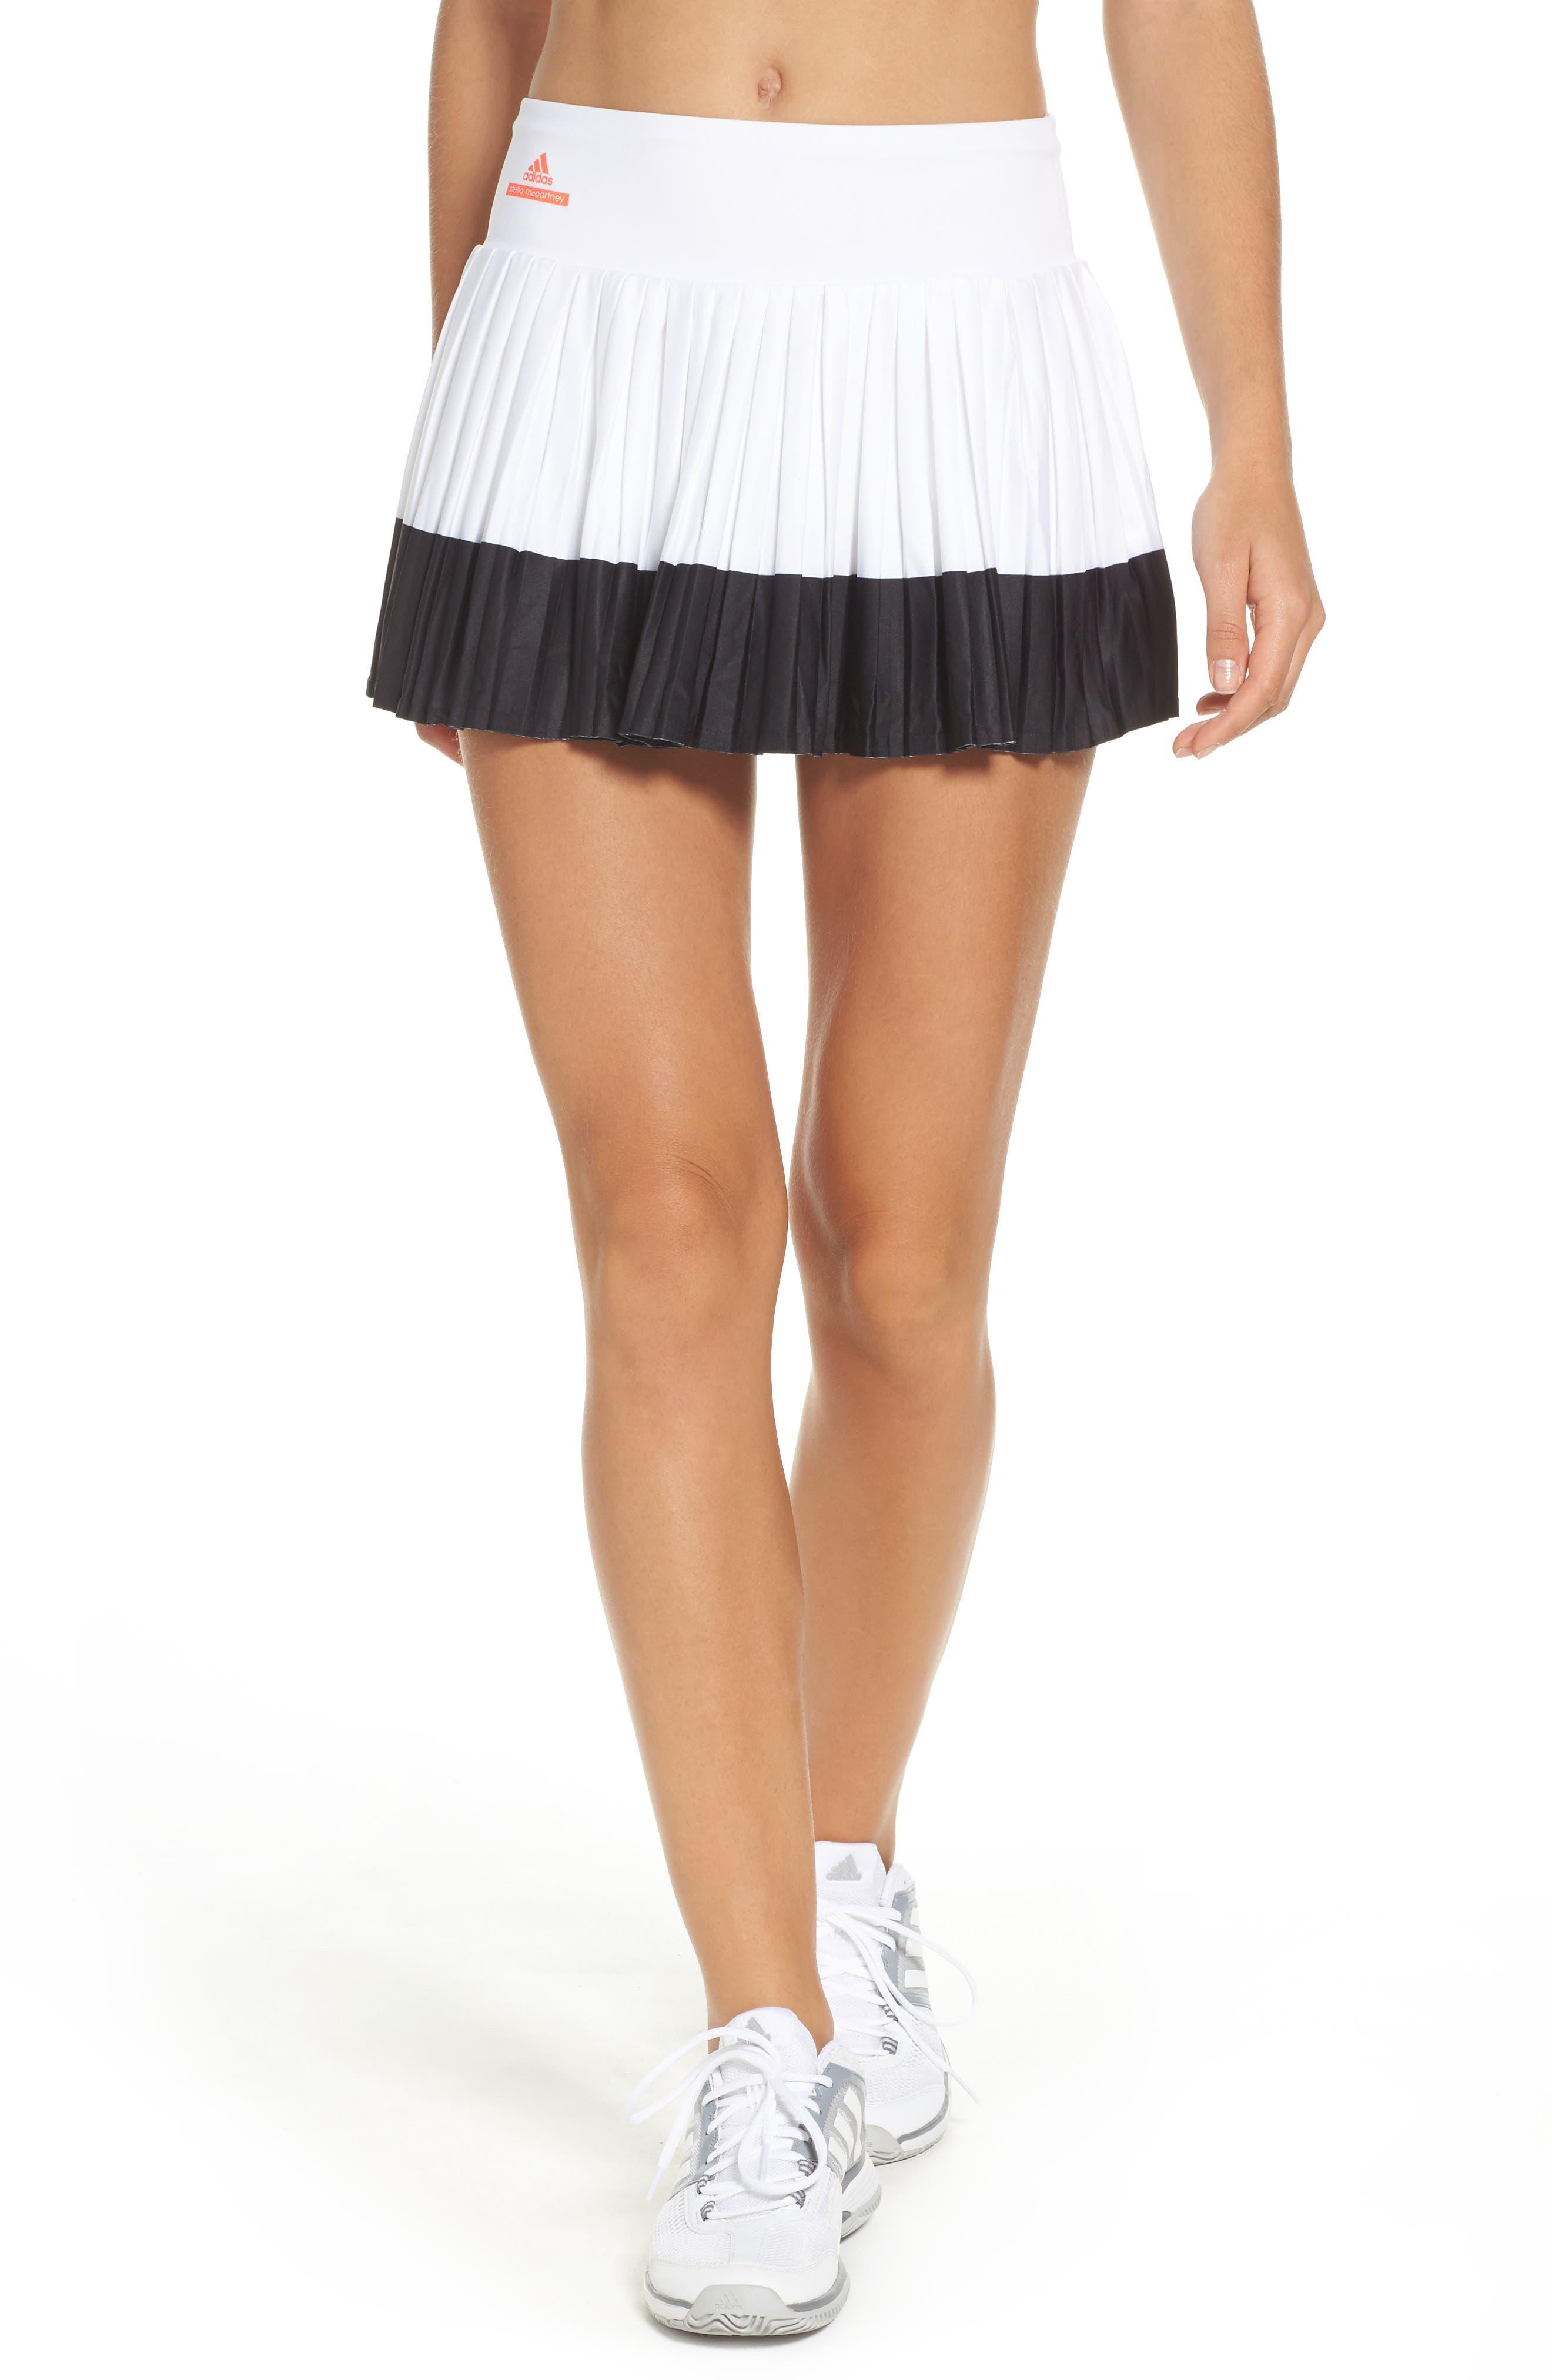 Main Image - adidas by Stella McCartney Barricade Skirt